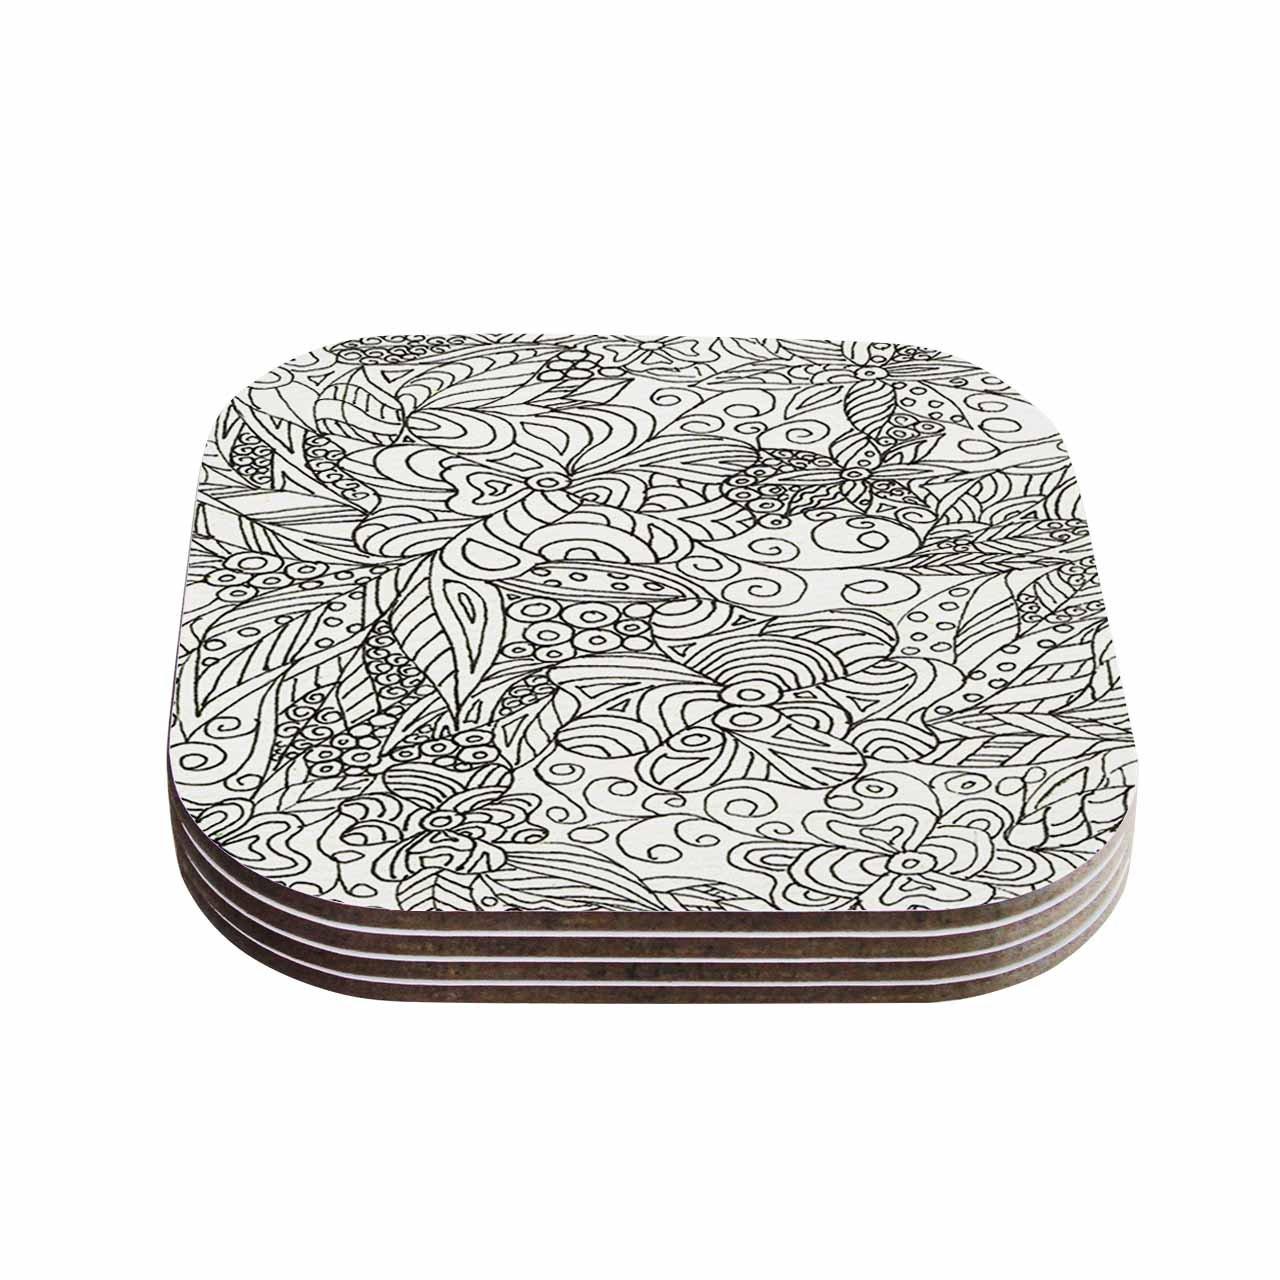 Set of 4 KESS InHouse Rosie BrownZentangle Garden Coasters Multicolor 4 x 4